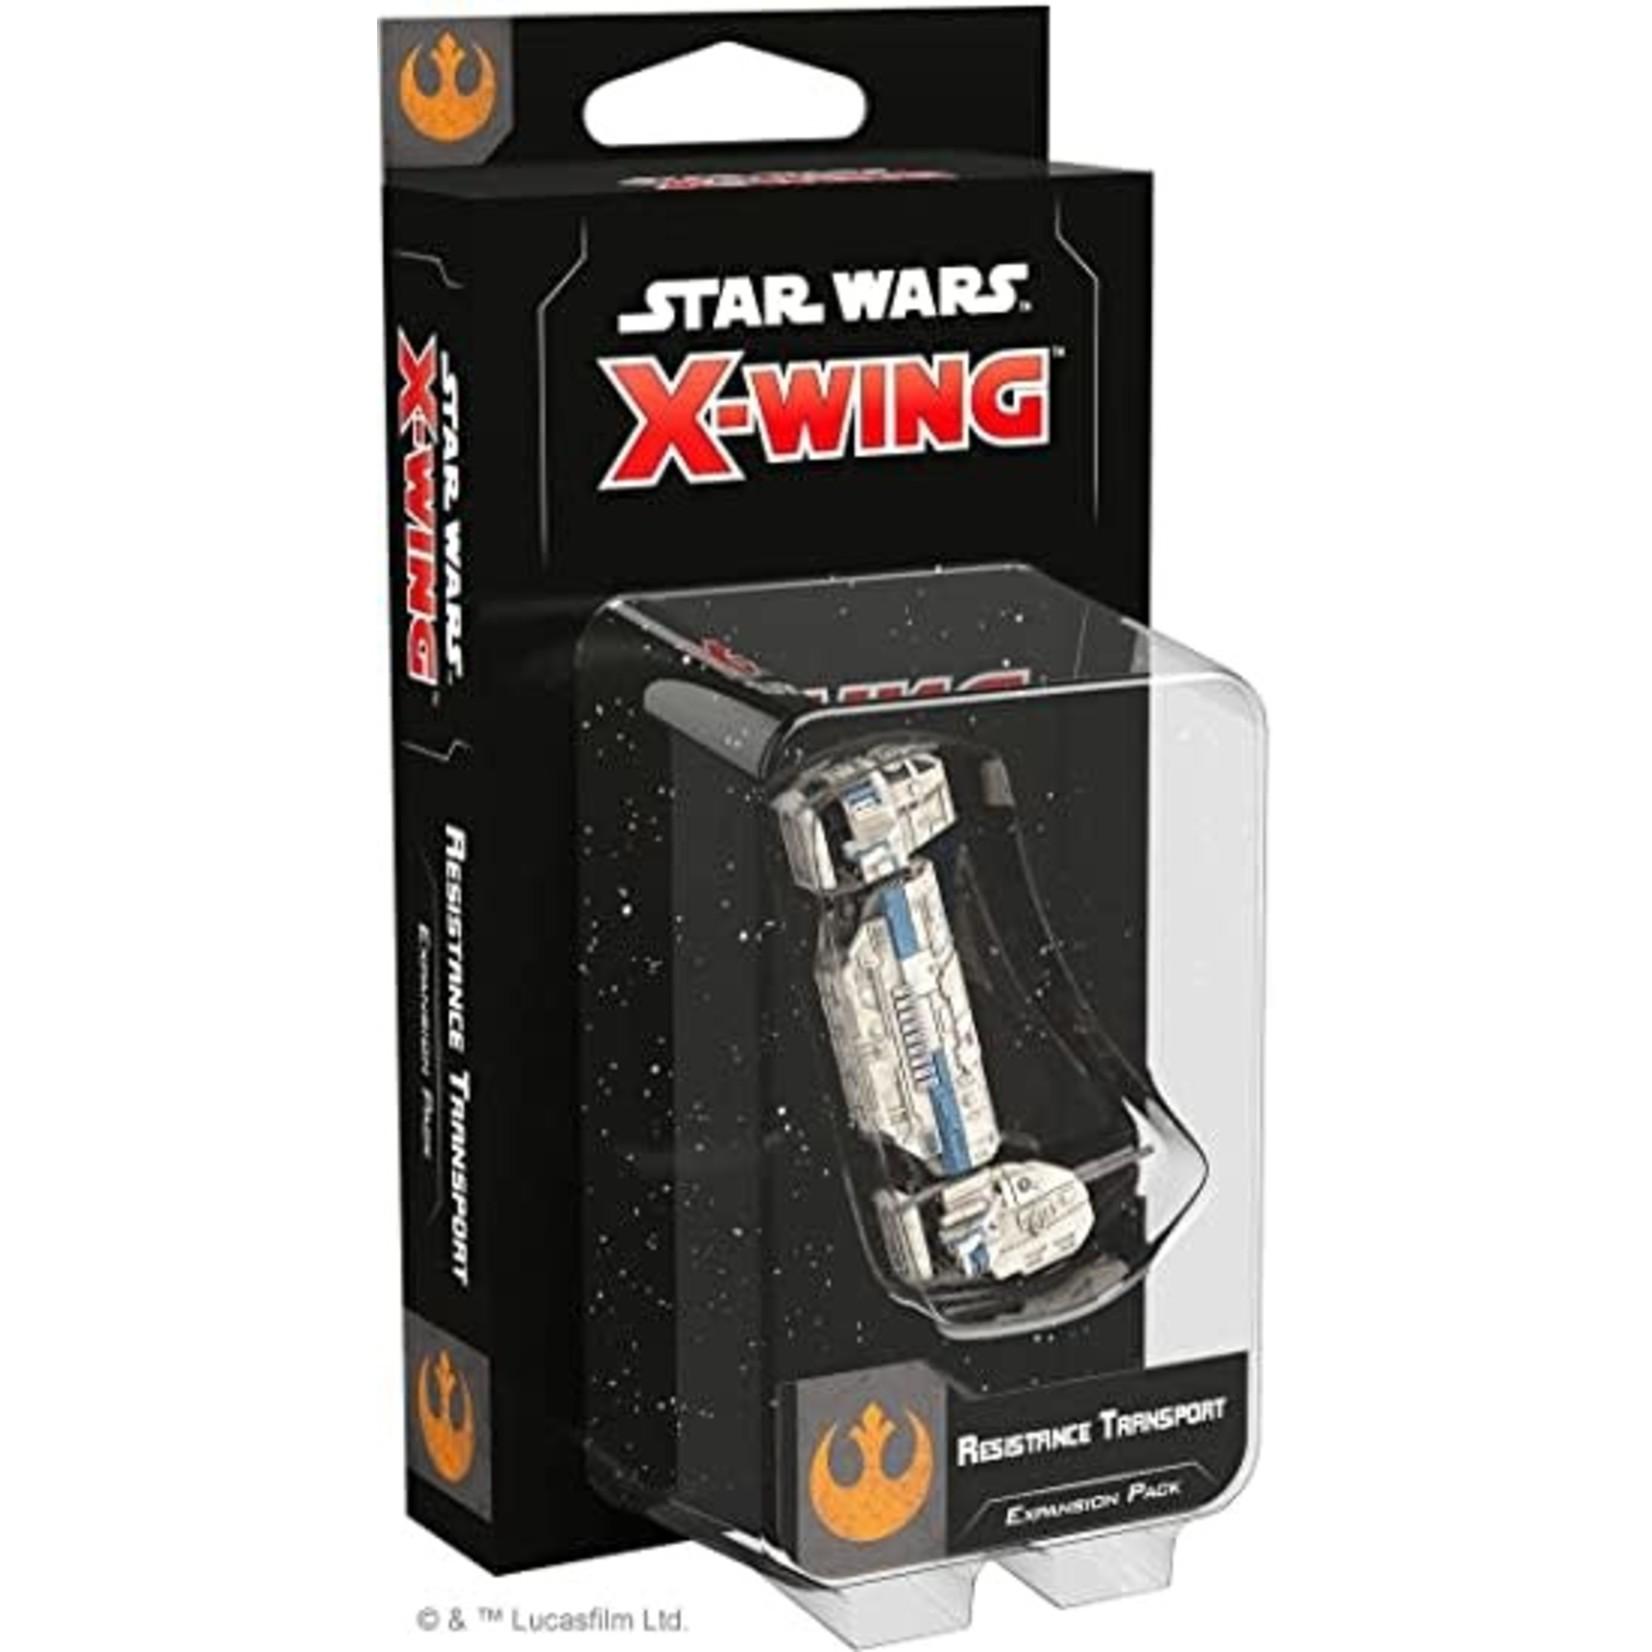 Fantasy Flight Games Star Wars X-Wing 2nd Edition: Resistance Transport Expansion Pack